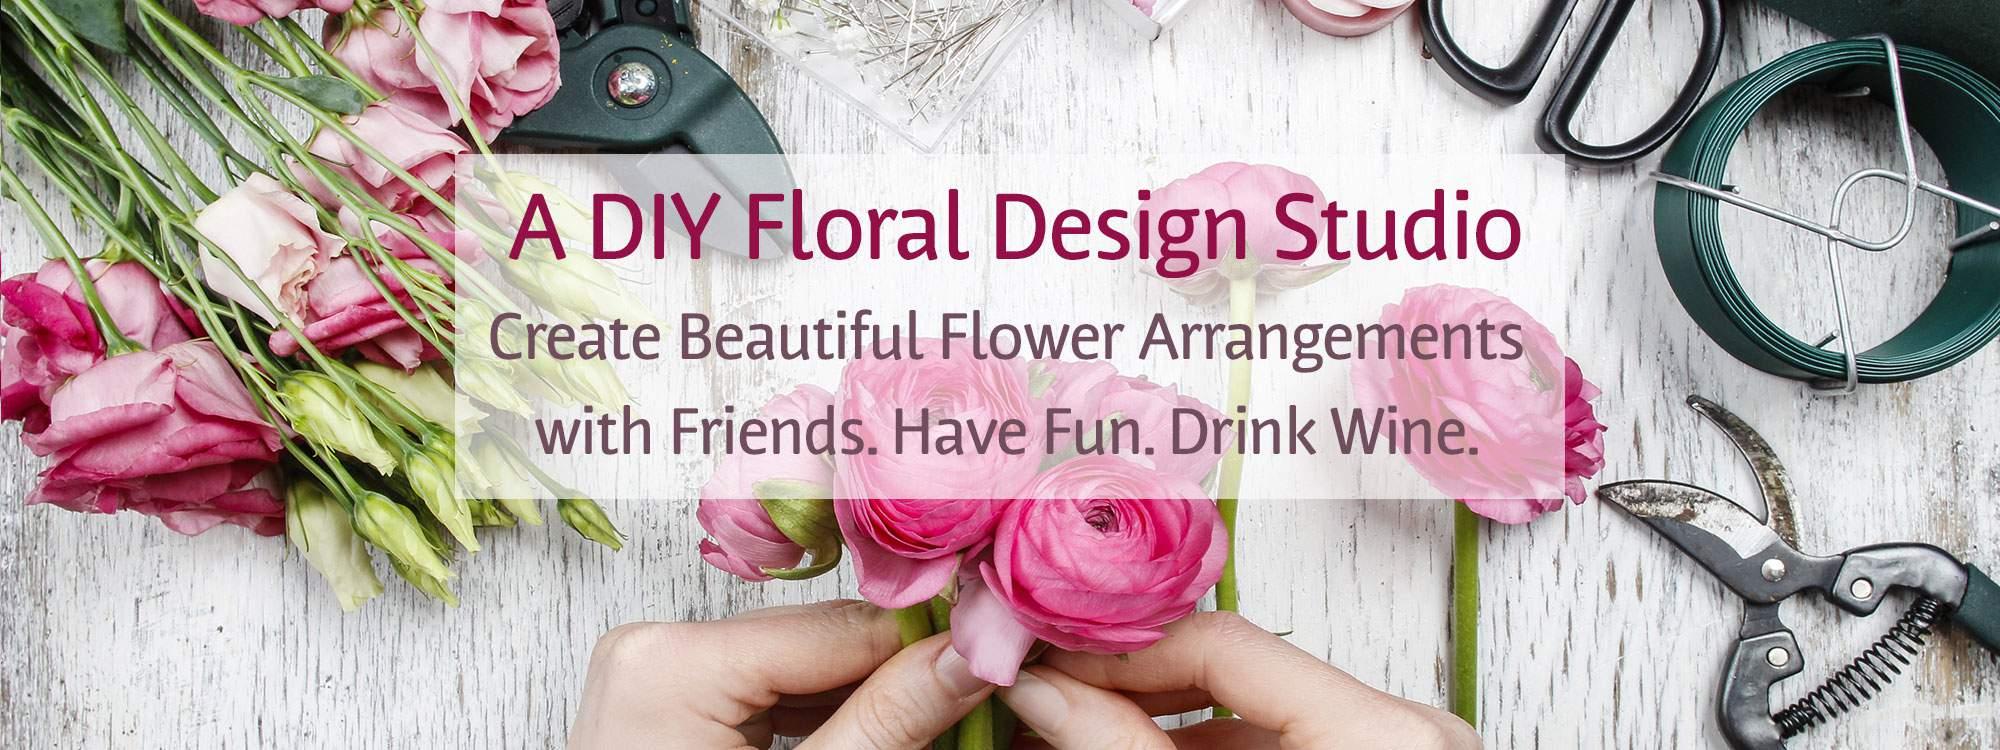 Bloom Woodstock DIY Floral Arrangement Image